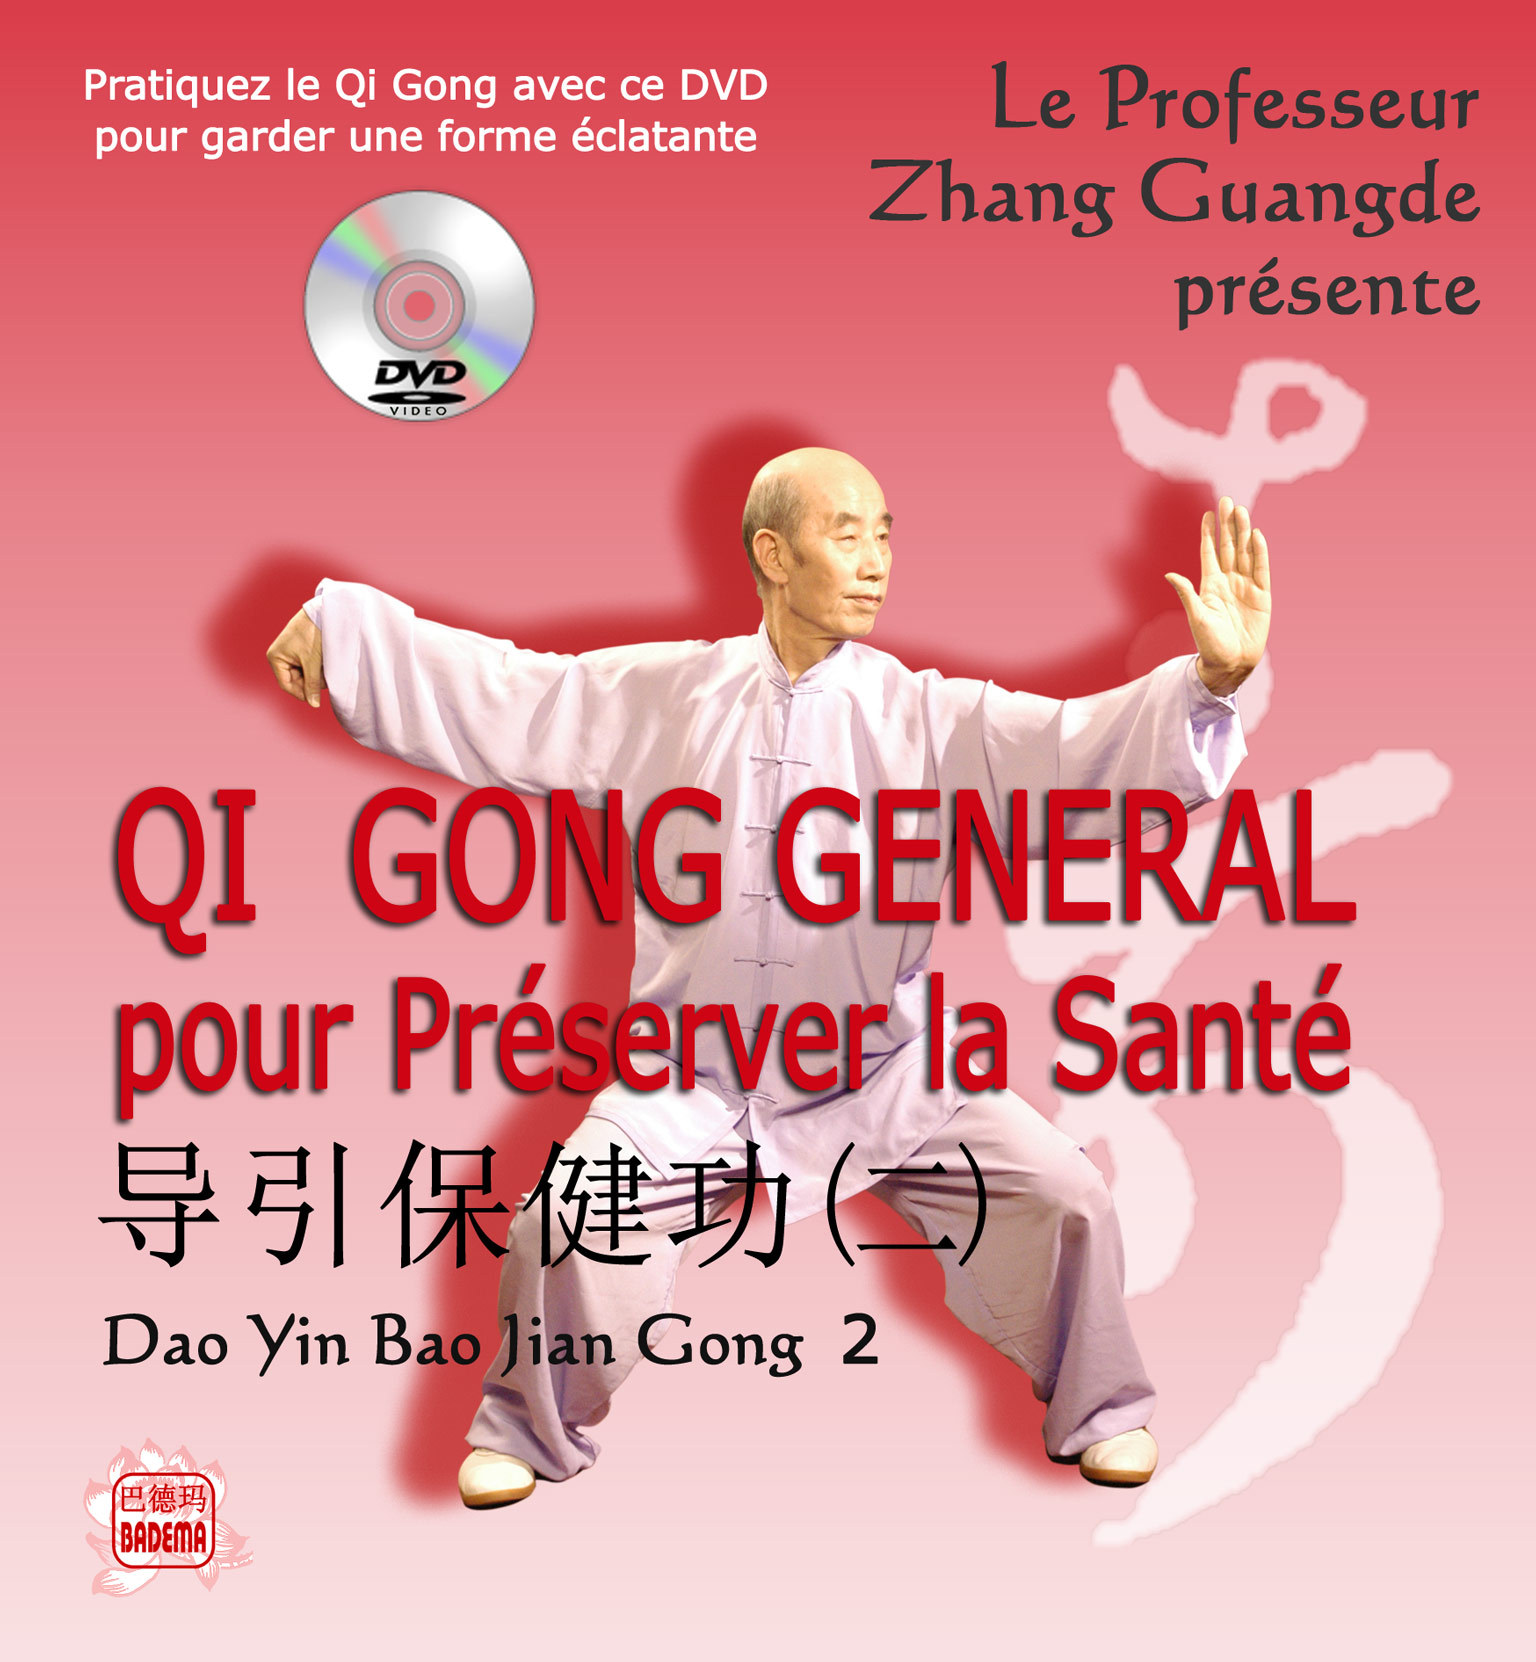 QI GONG GENERAL POUR PRESERVER LA SANTE